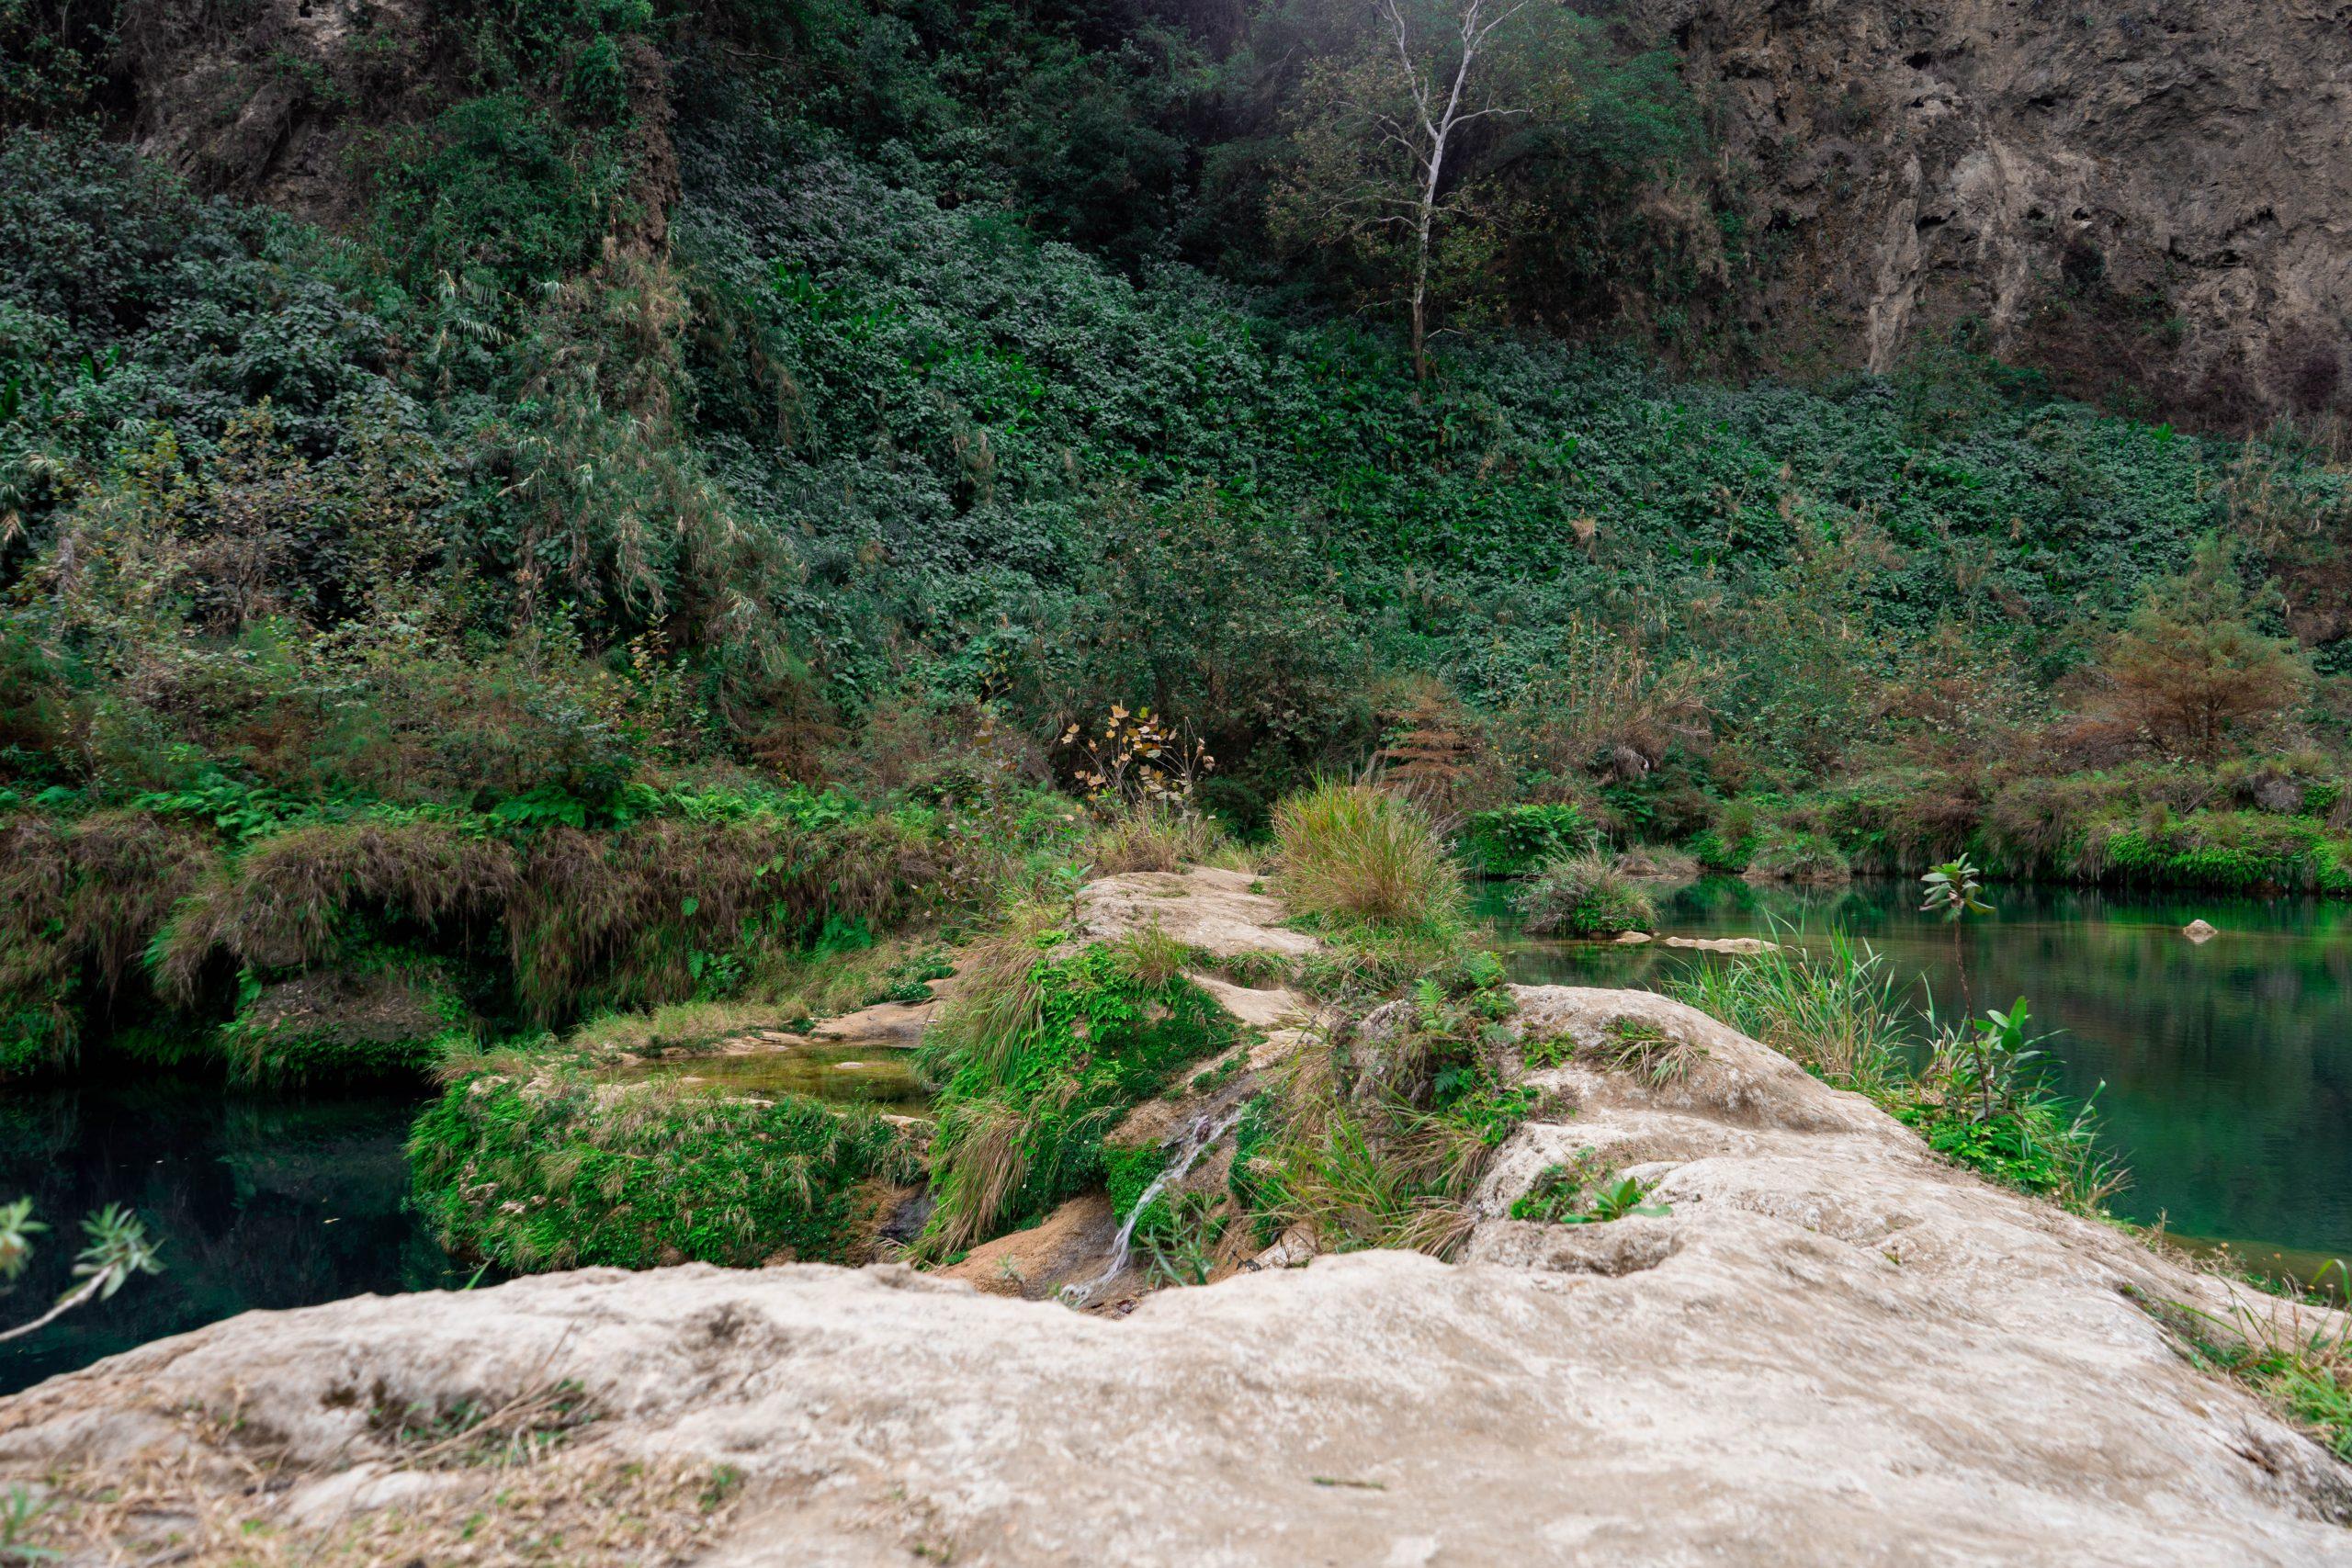 cascada el salto del agua la huasteca potosina san luis potosi mexico adventure travel water feature hiking rock formation lush greenery